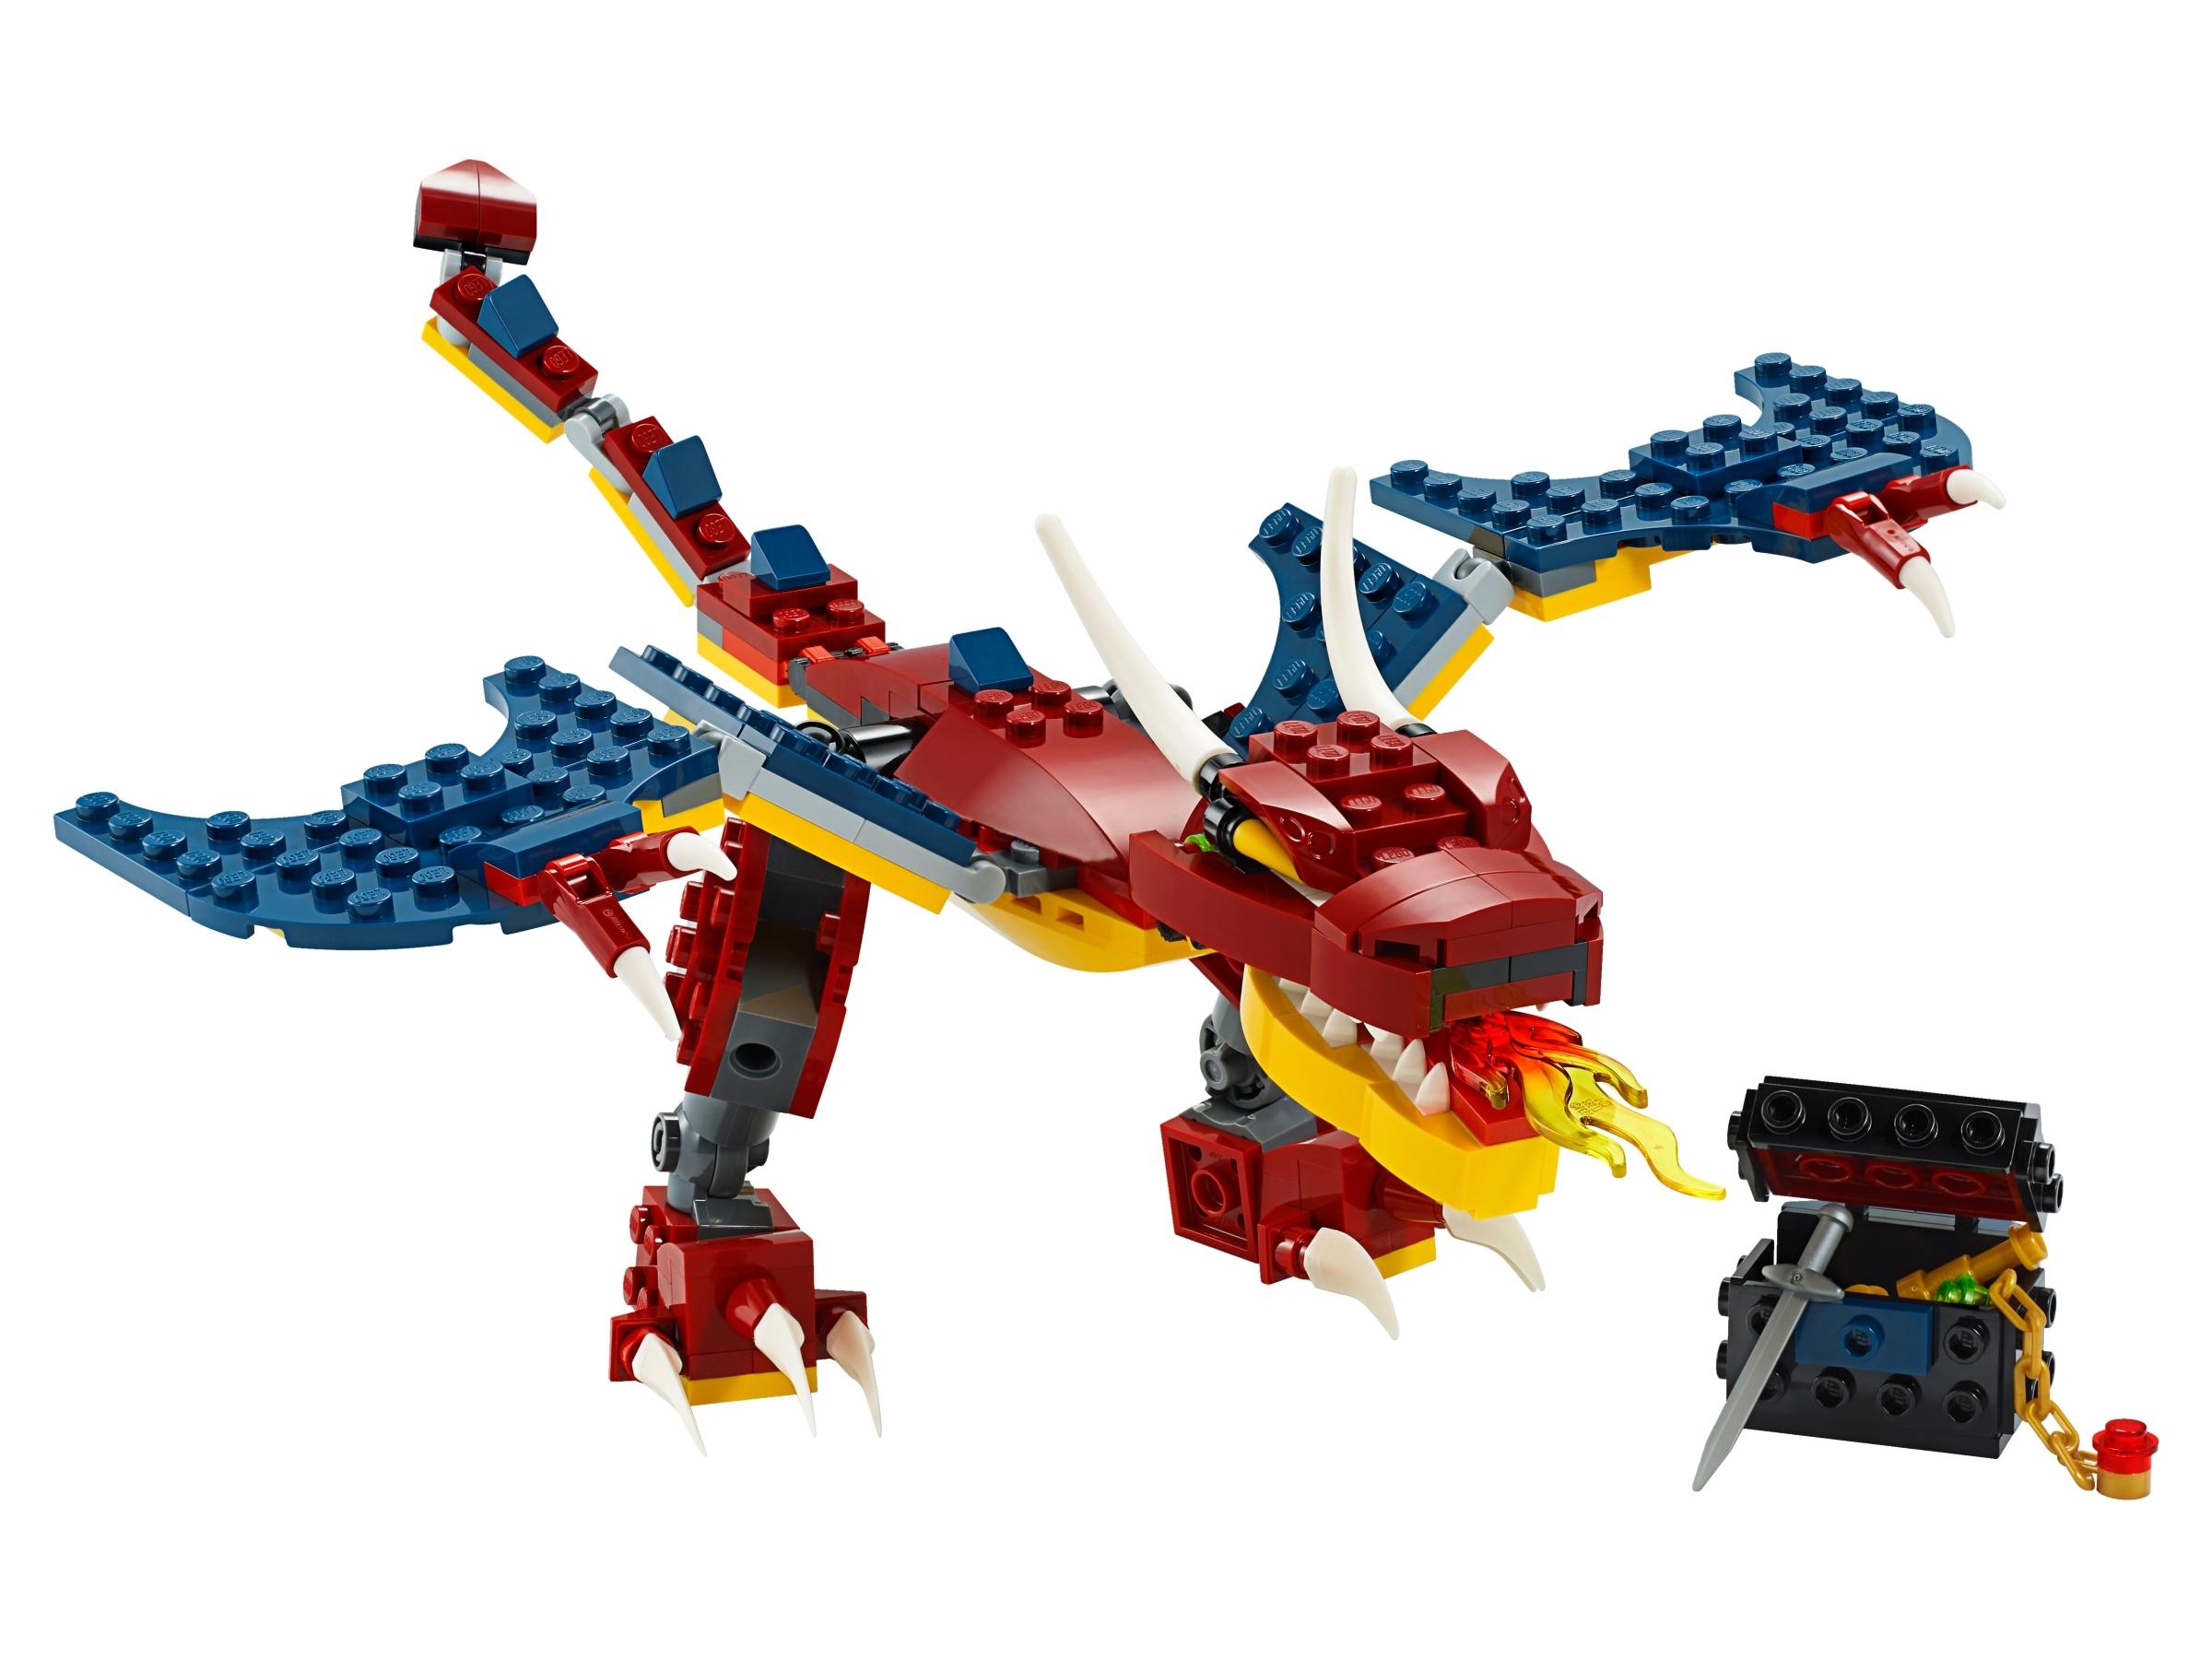 1x Lego Bionicle Drachen Kopf Ninjago grau grün Dragon 2509 4642887 93072pb02